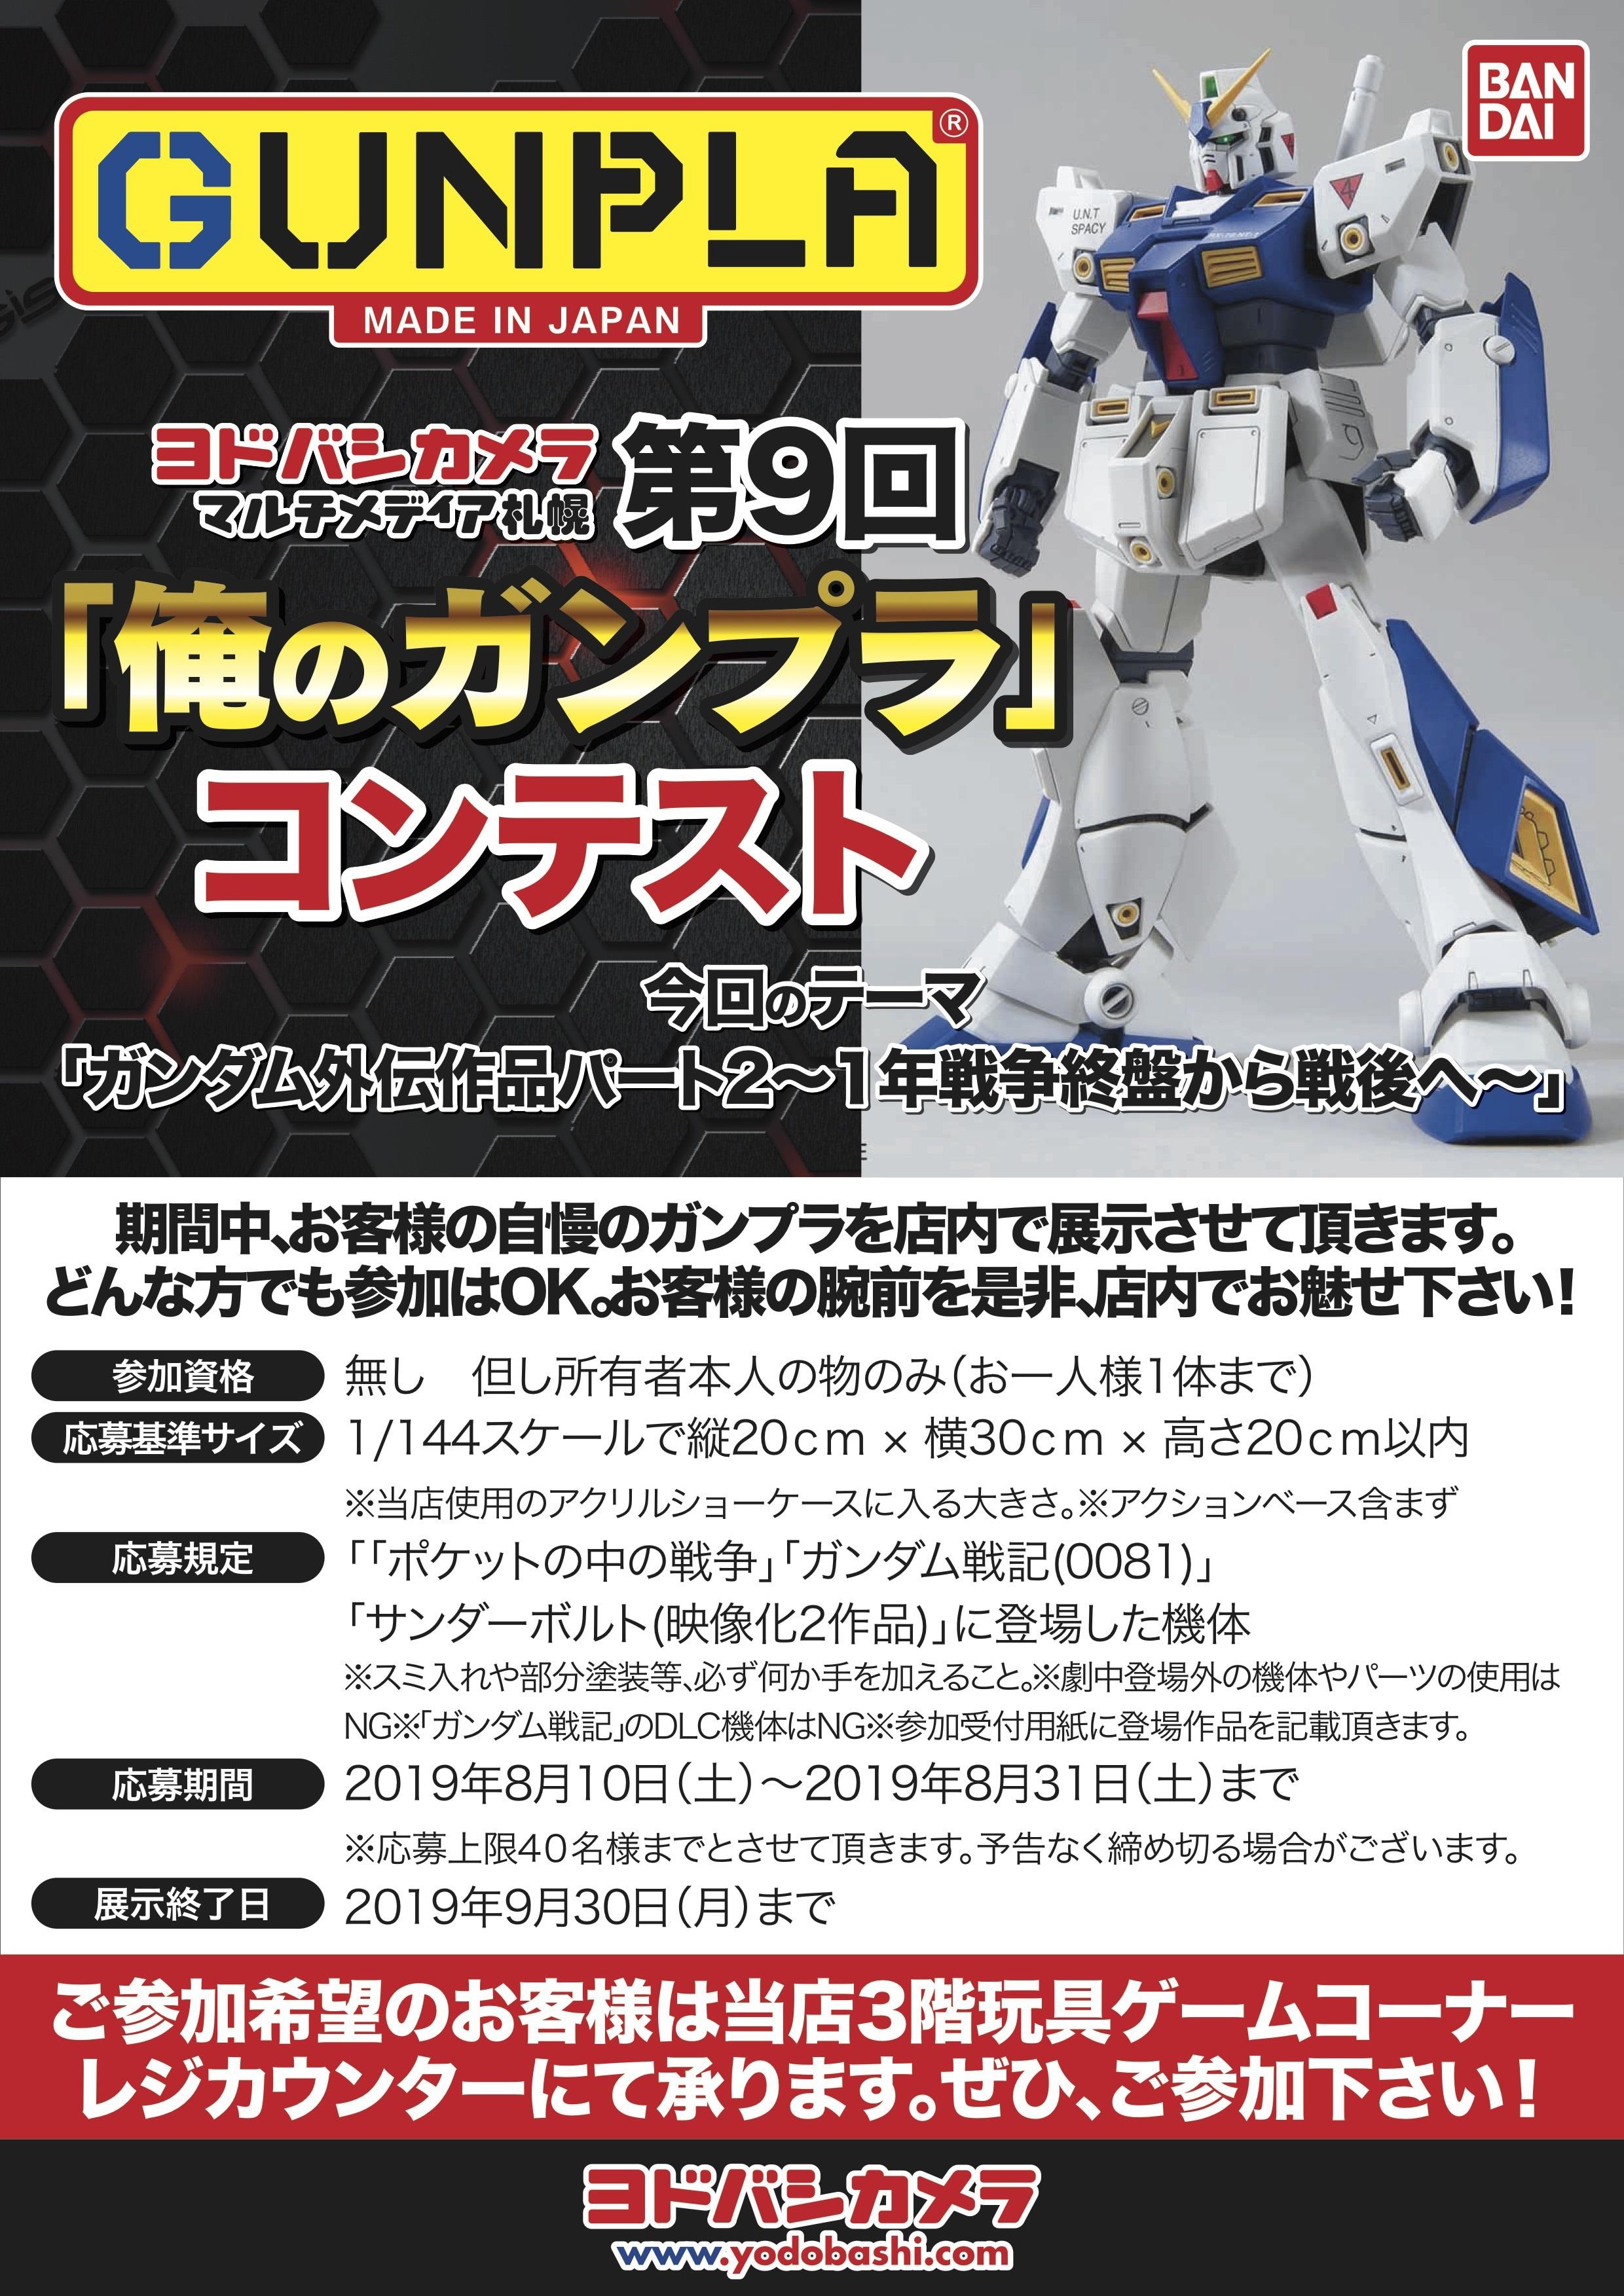 http://image.yodobashi.com/promotion/a/9269/200000017500062422/SD_200000017500062422510B1.jpg